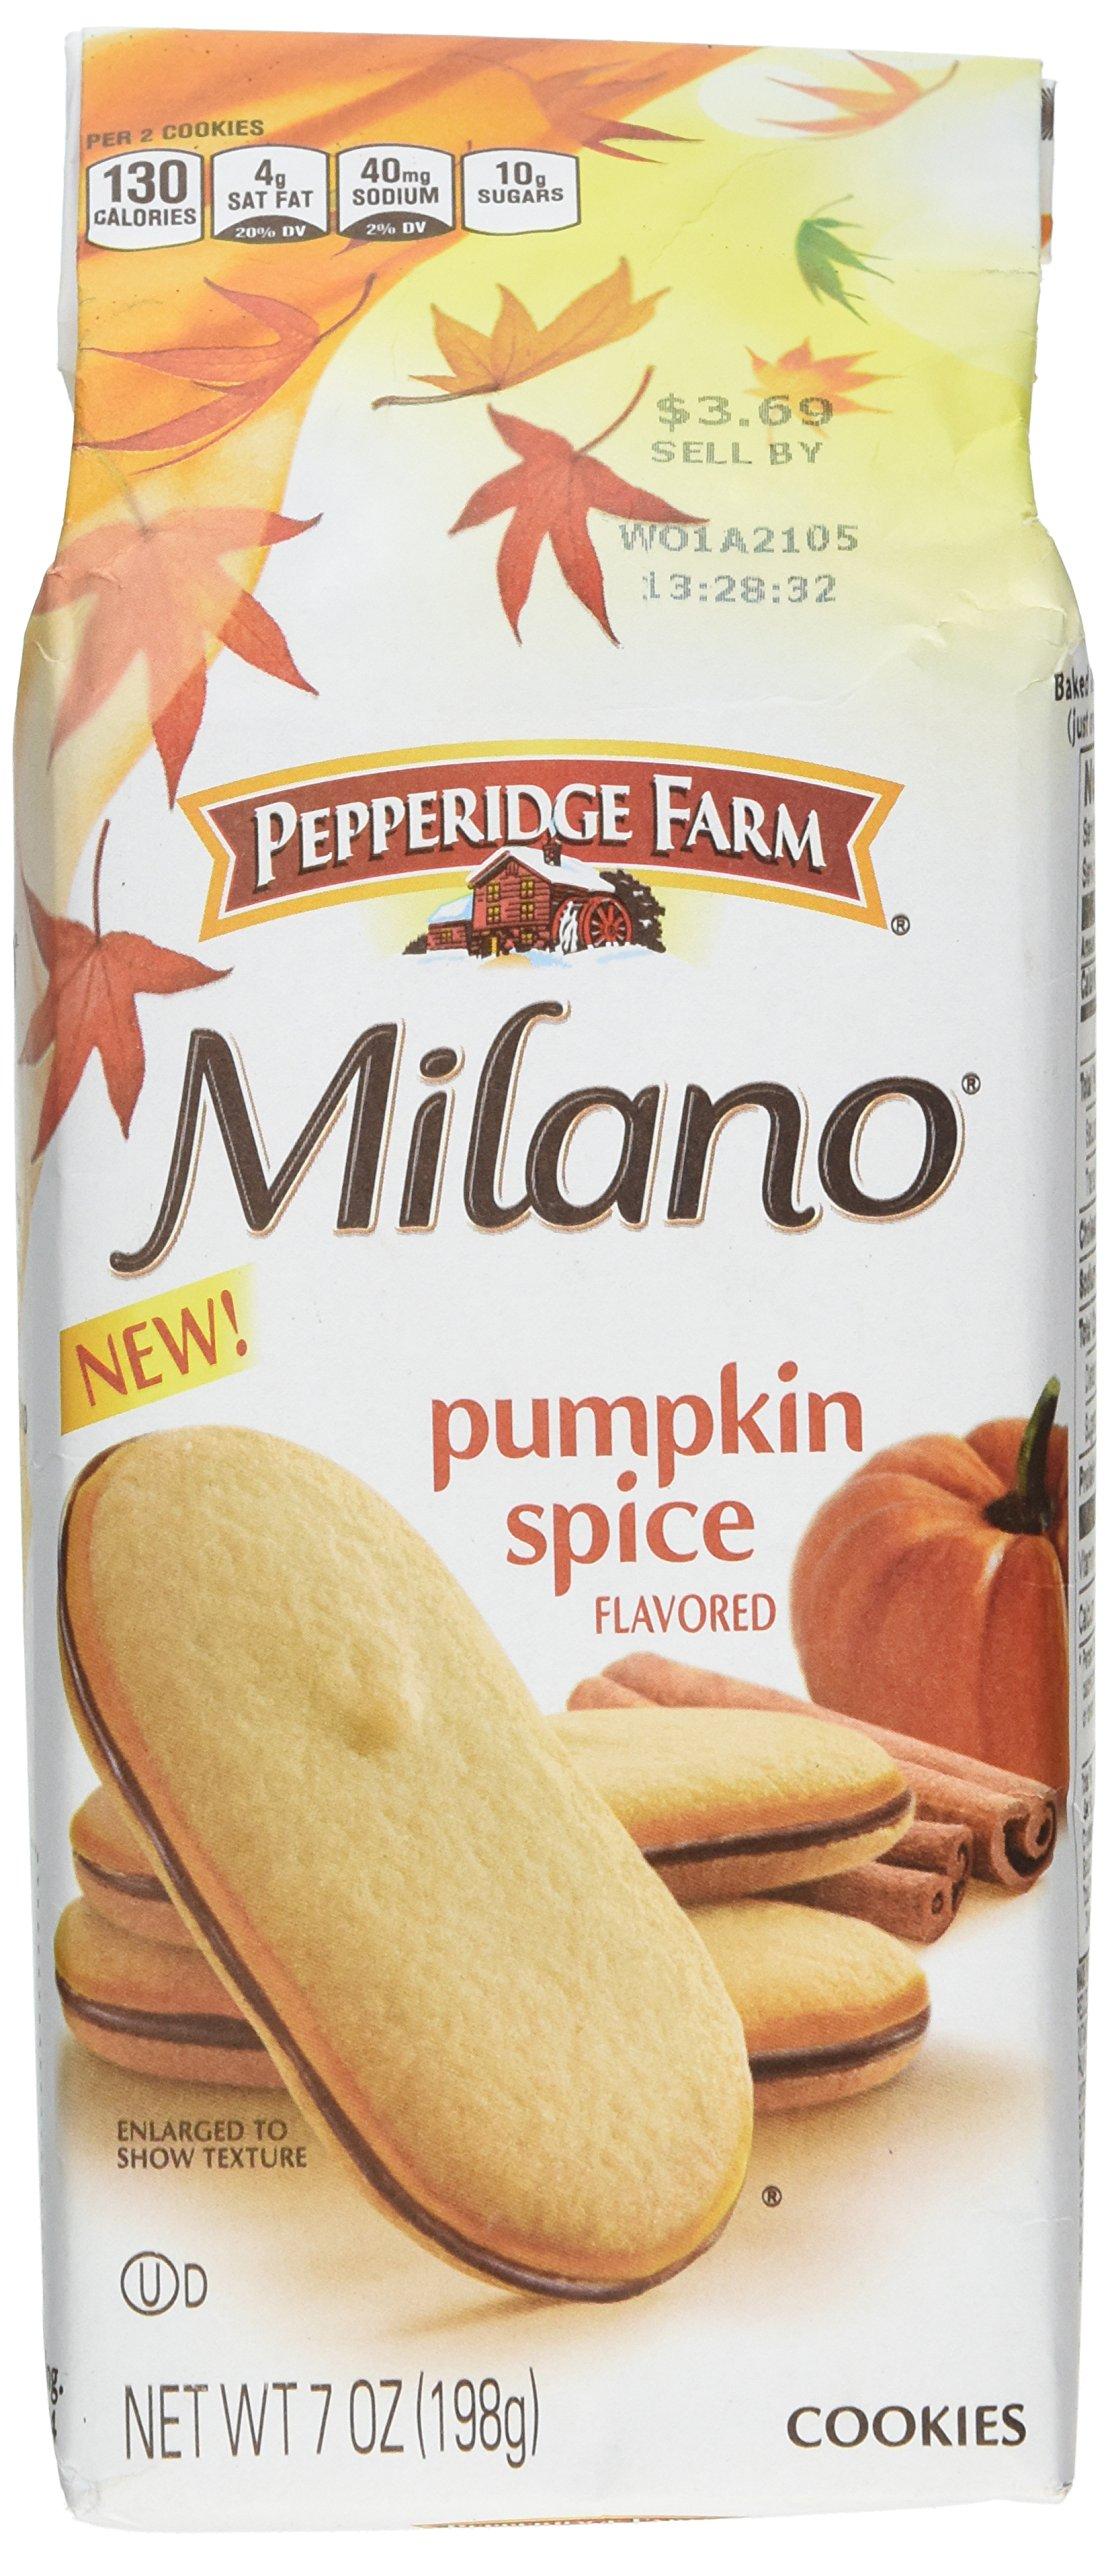 PEPPERIDGE FARM COOKIES MILANO PUMPKIN SPICE 7 OZ by Pepperidge Farm